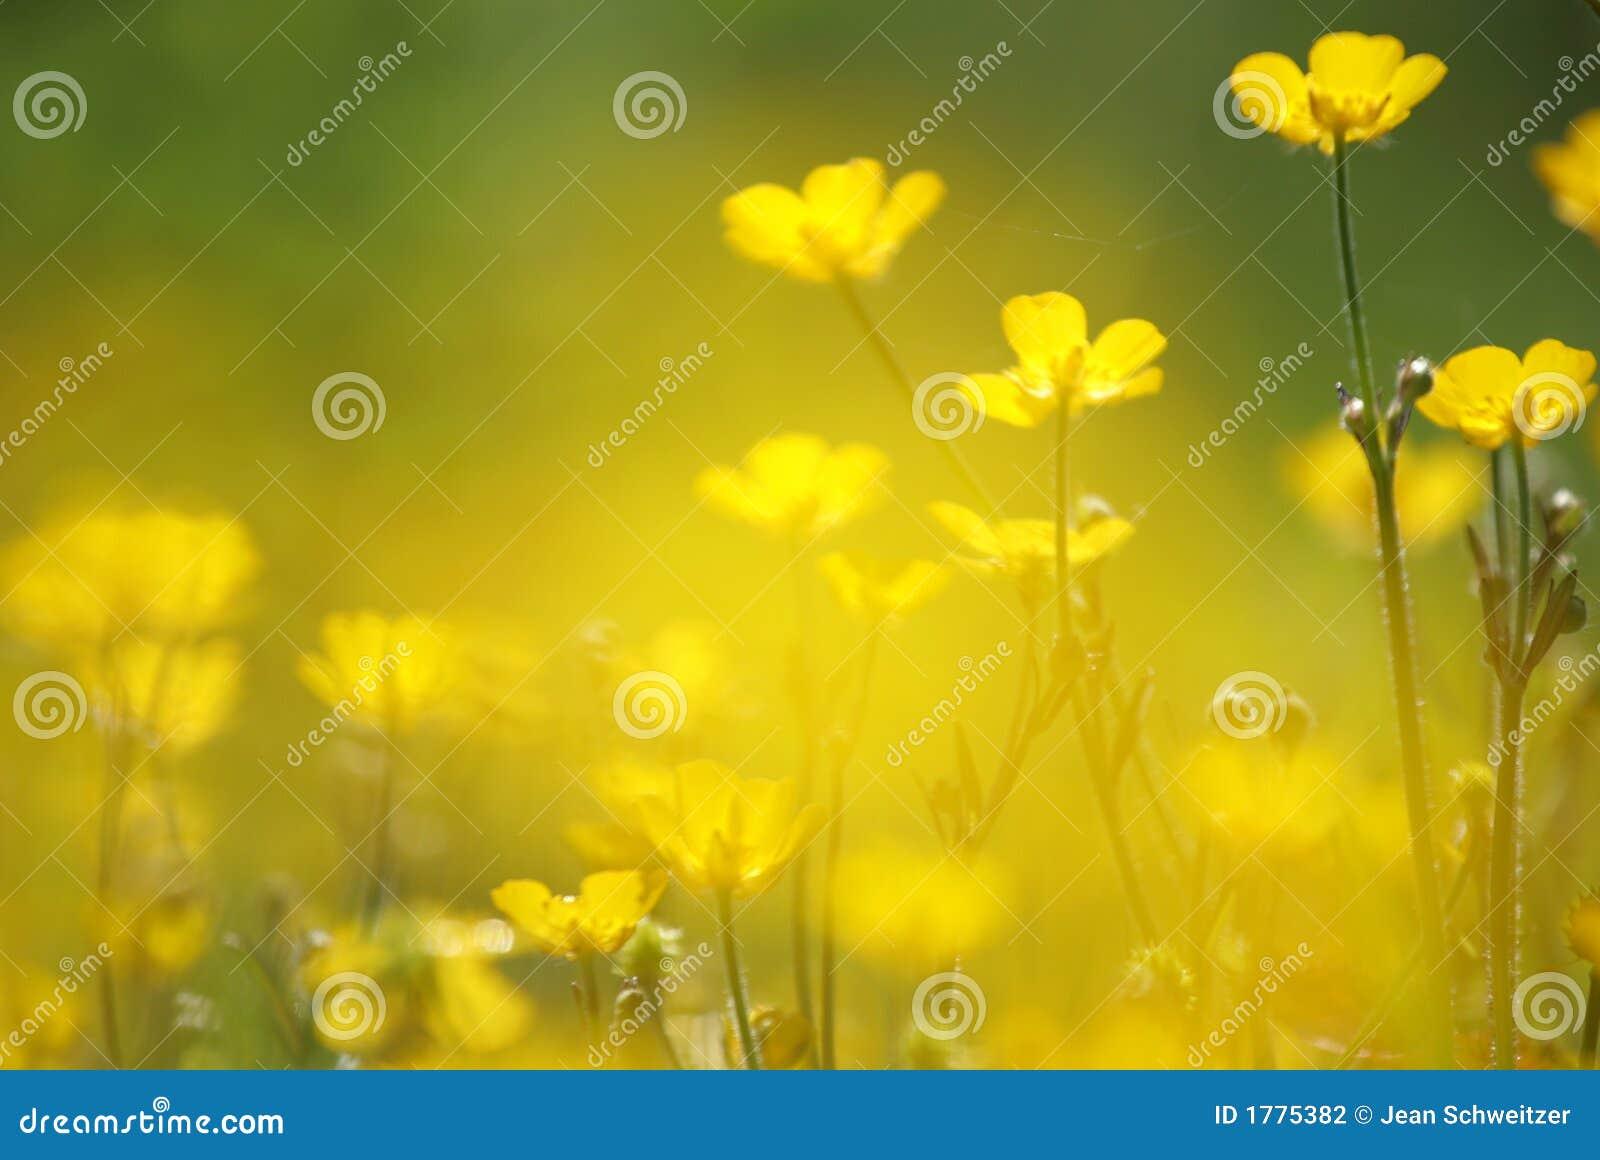 желтый цвет цветка крупного плана